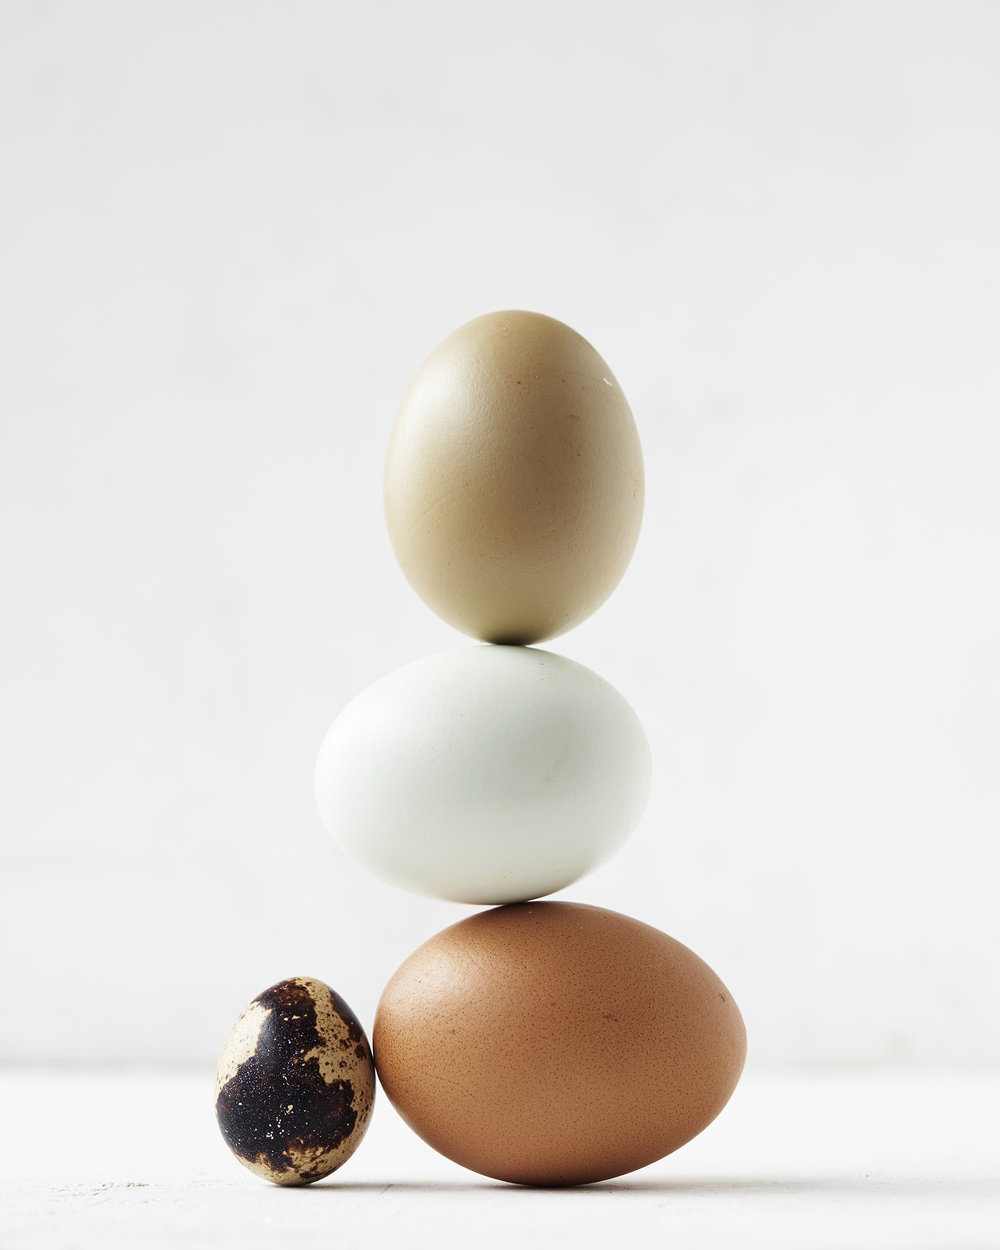 EggShop_EggStillLife8473.jpg